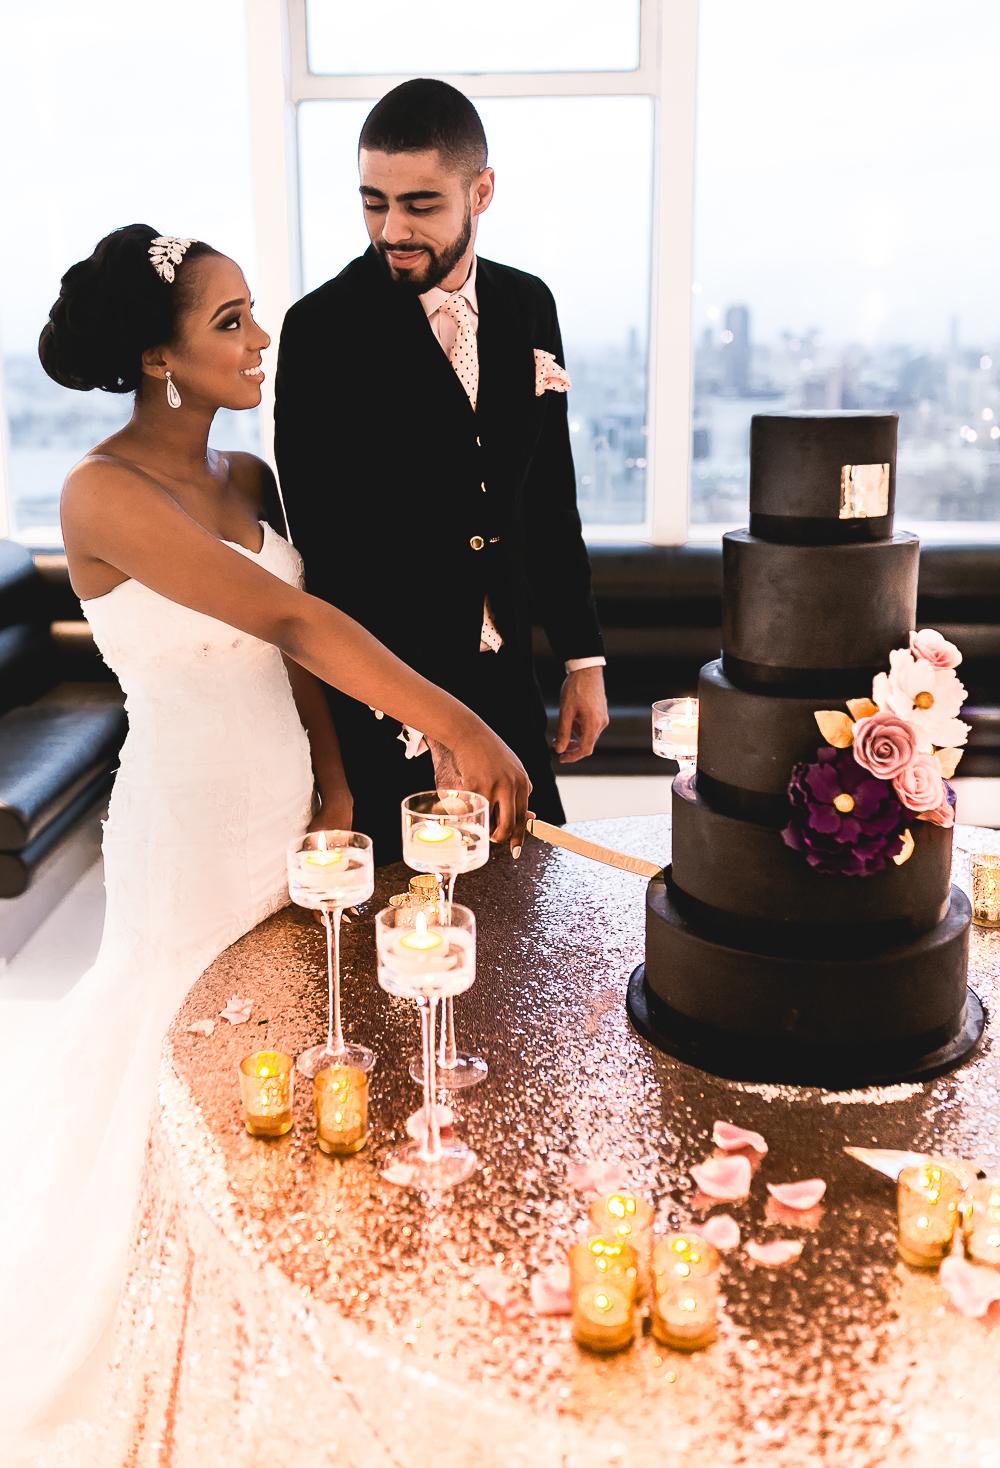 Francesca bodini wedding